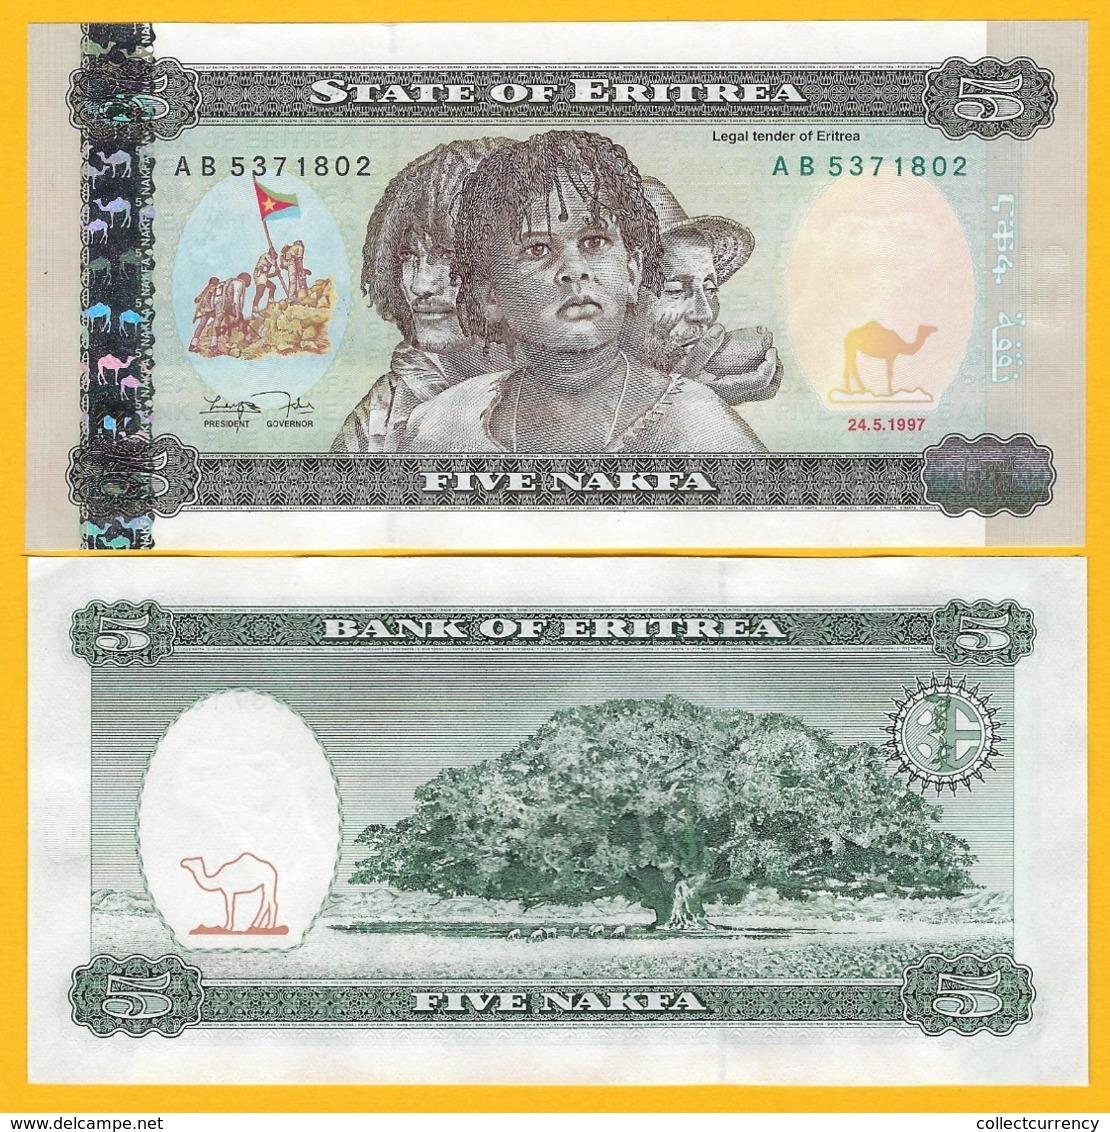 Eritrea 5 Nakfa P-2 1997 UNC Banknote - Eritrea